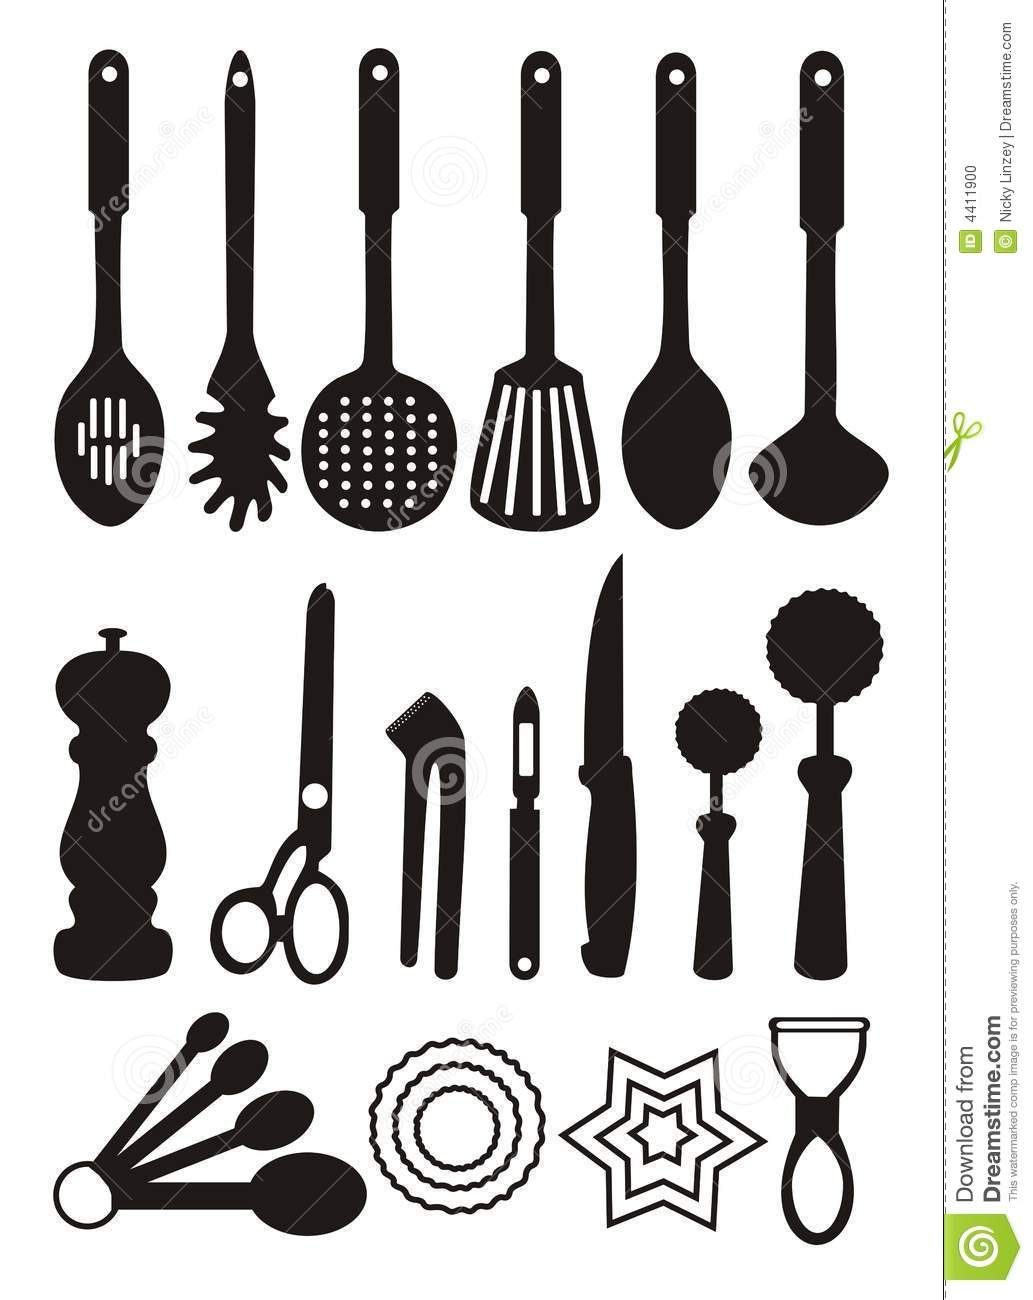 Tools clip art free. Kitchen clipart utensils